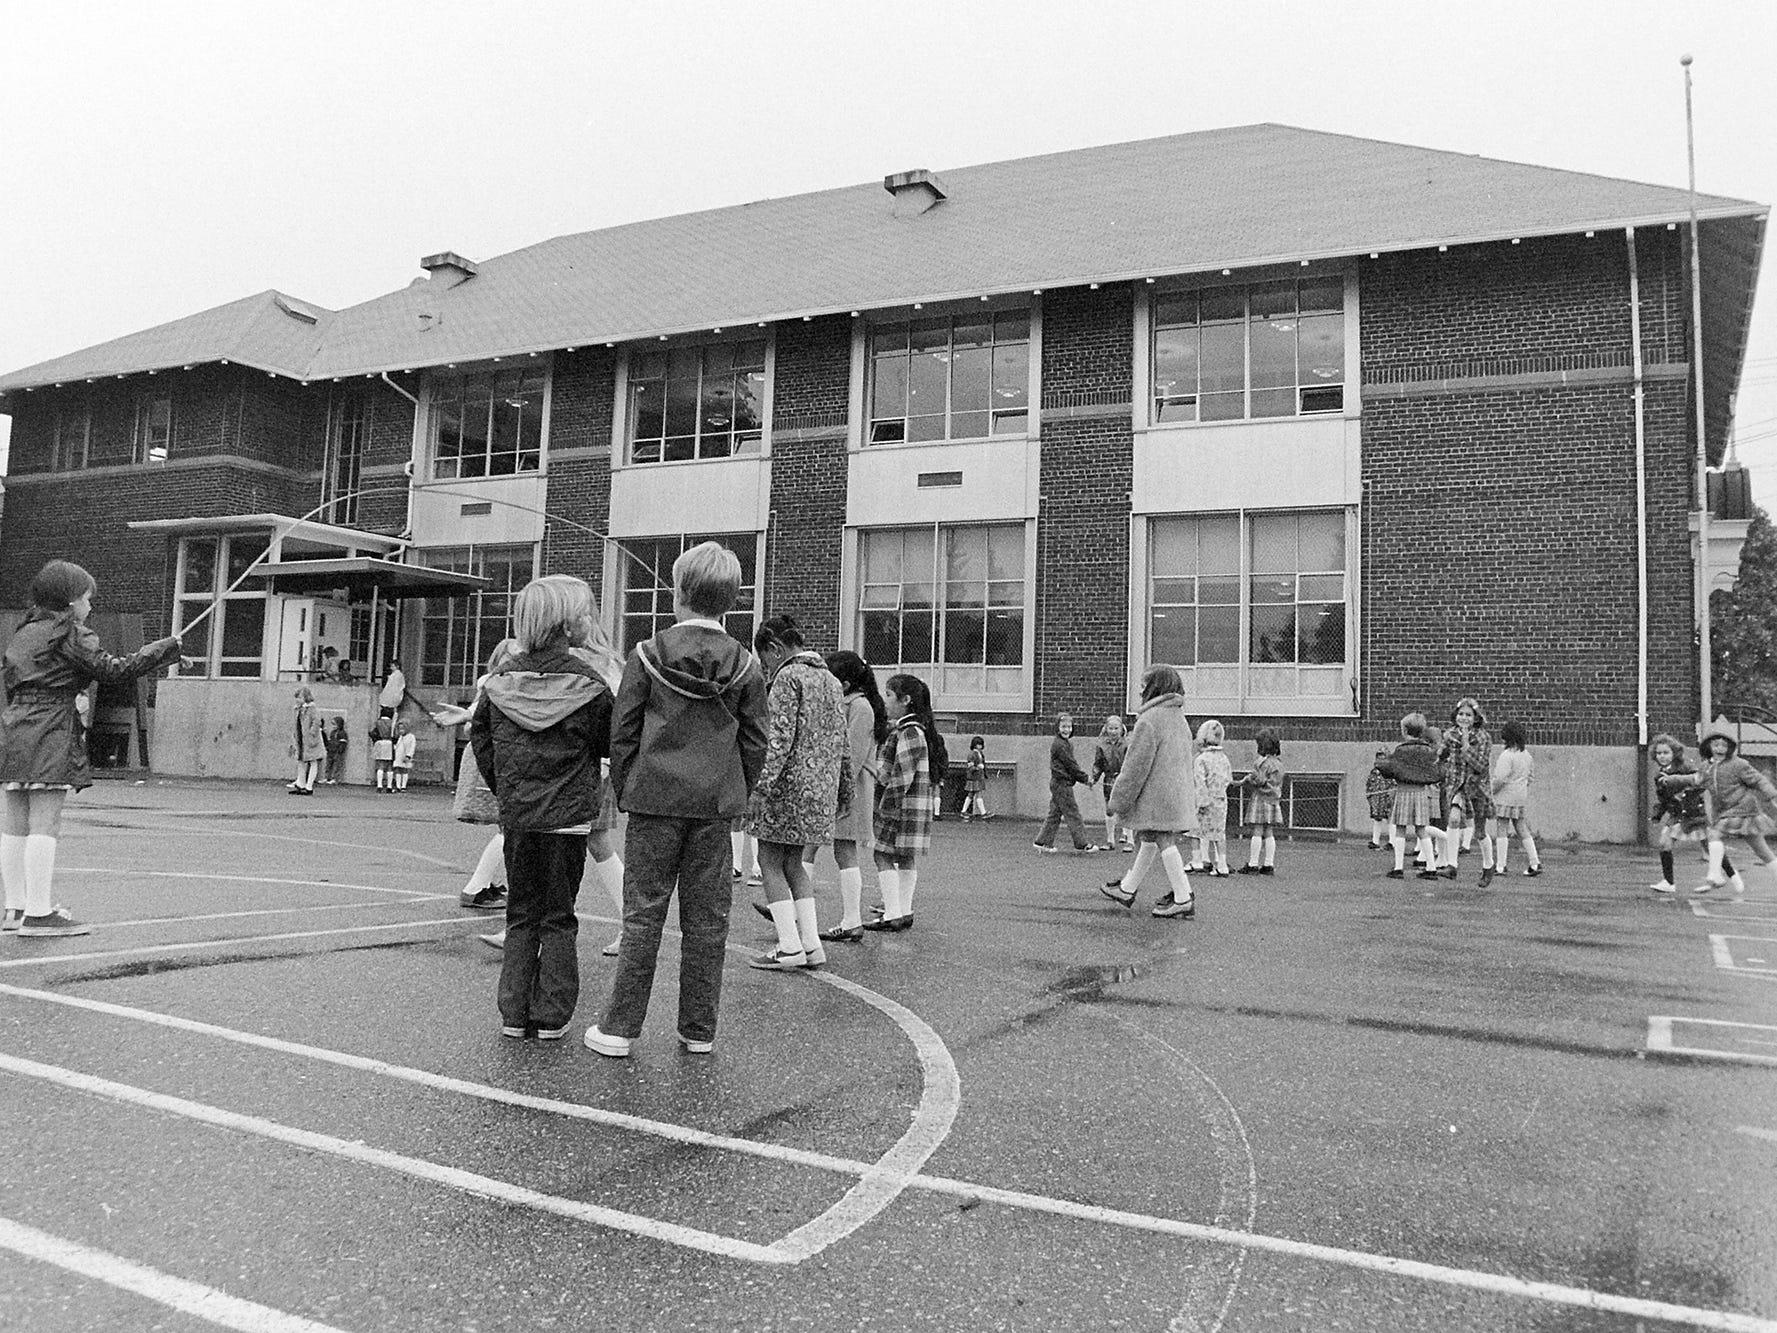 09/17/73Star Of The Sea School